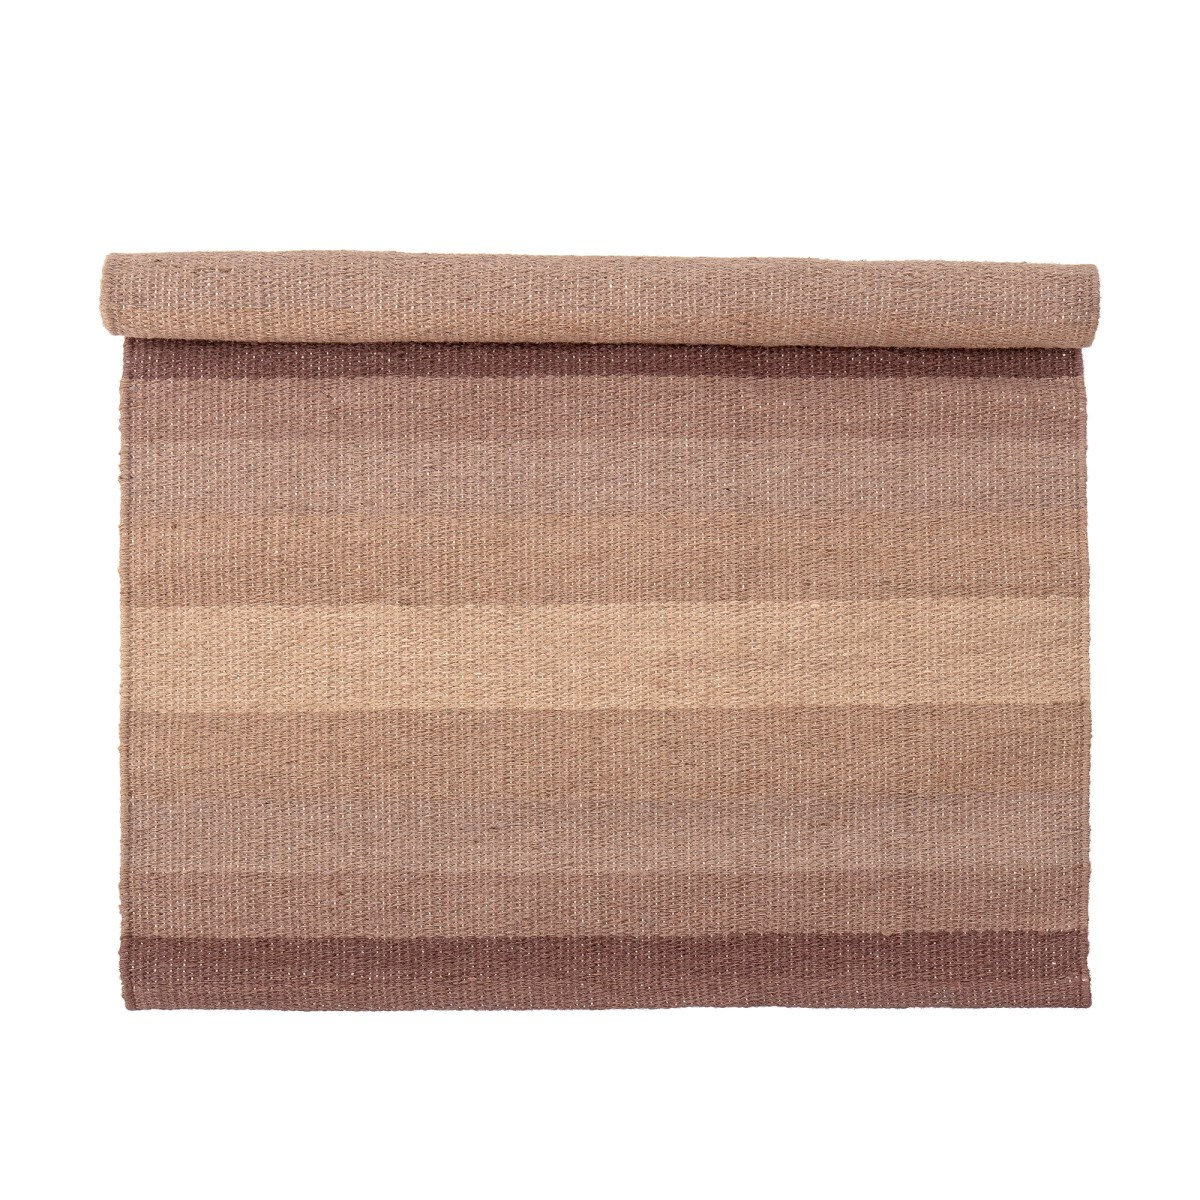 Jutový koberec 90x60 cm_2